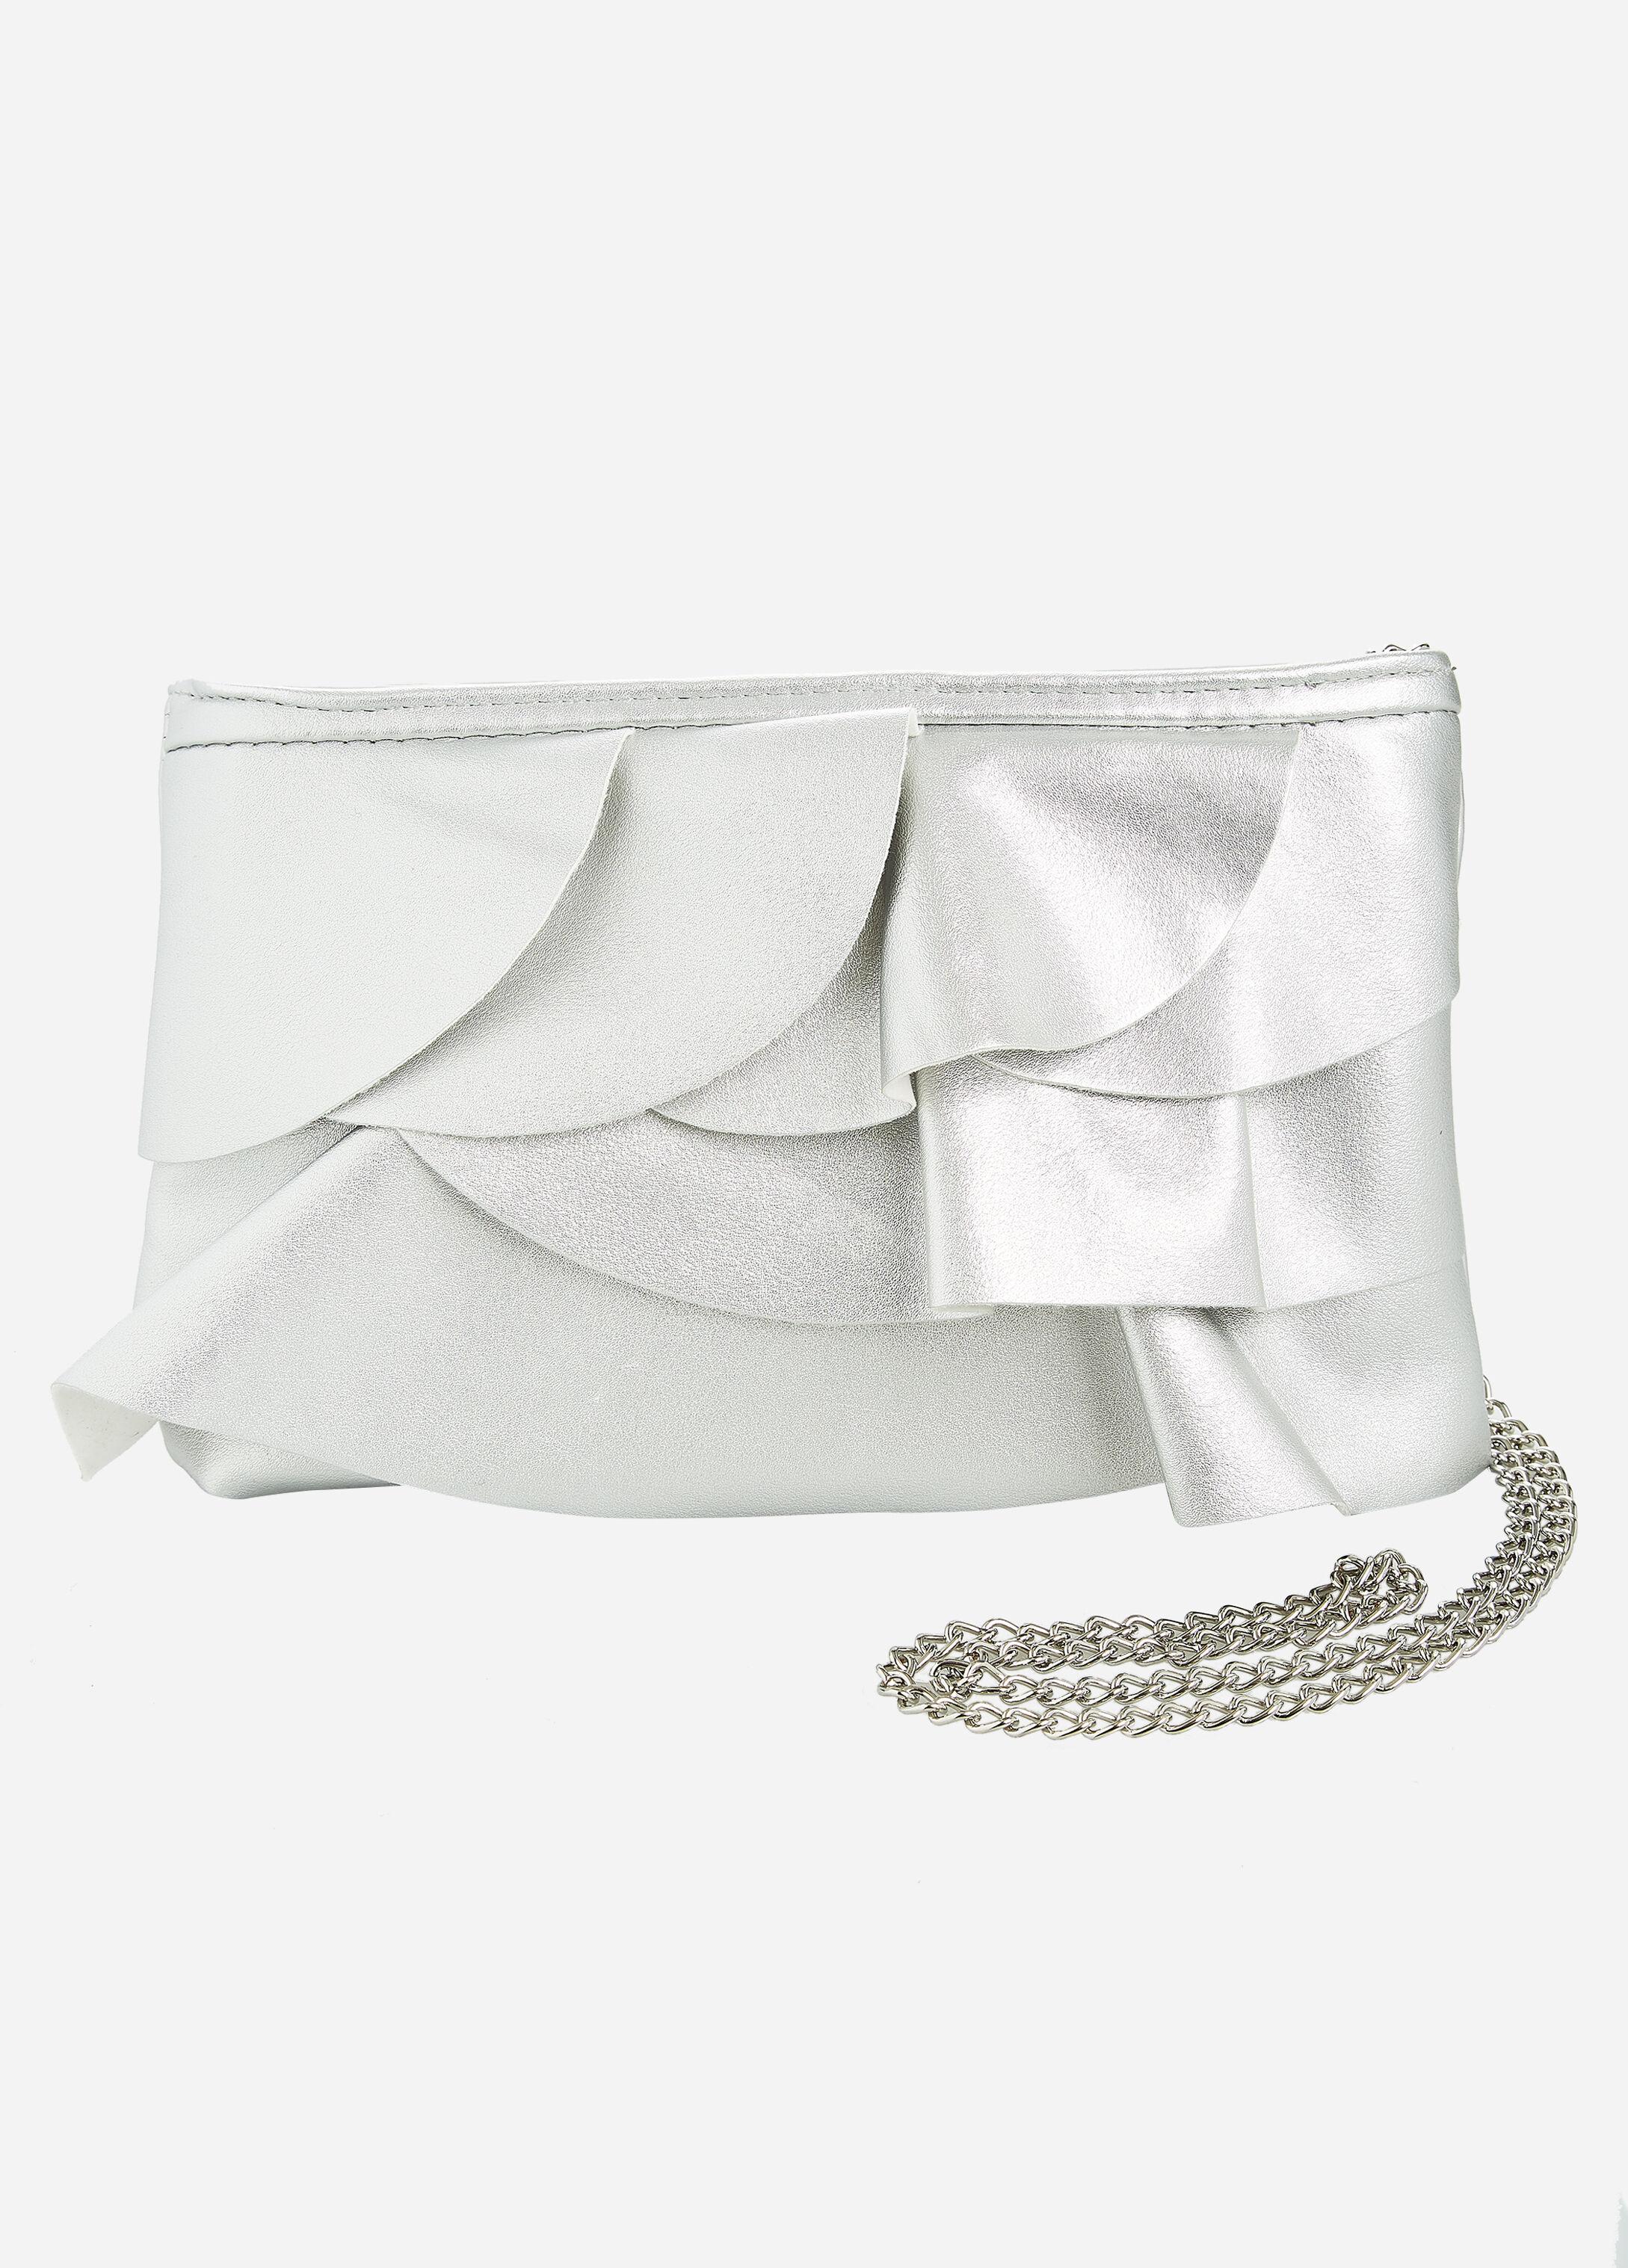 Multi-Tier Ruffle Shoulder Bag